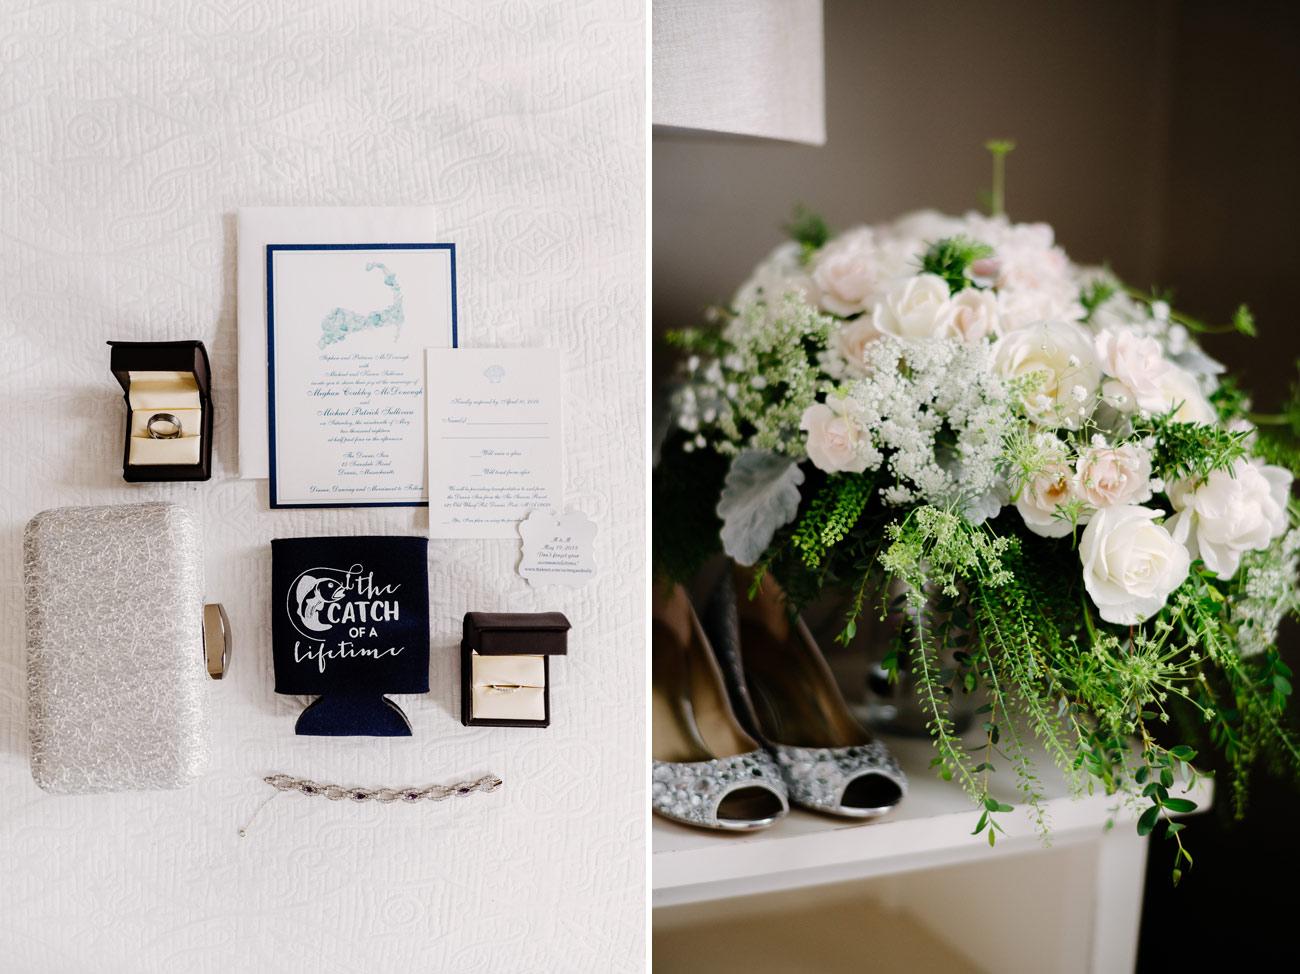 dennis_inn_wedding_mikhail_glabets_4.JPG